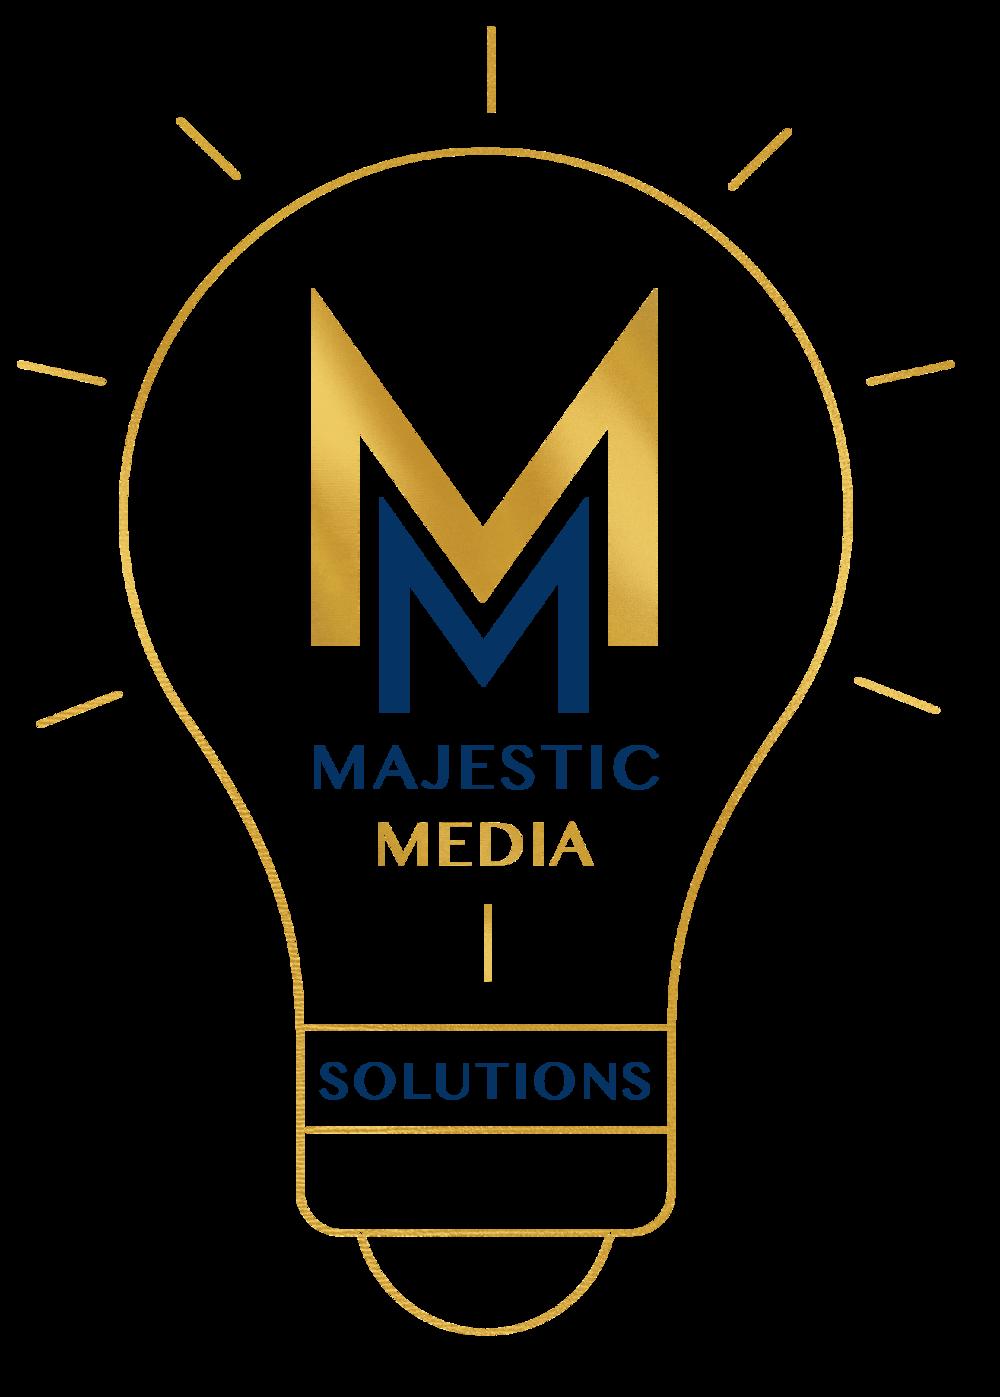 Majestic-Media-Solutions-Alternate-Logo.png